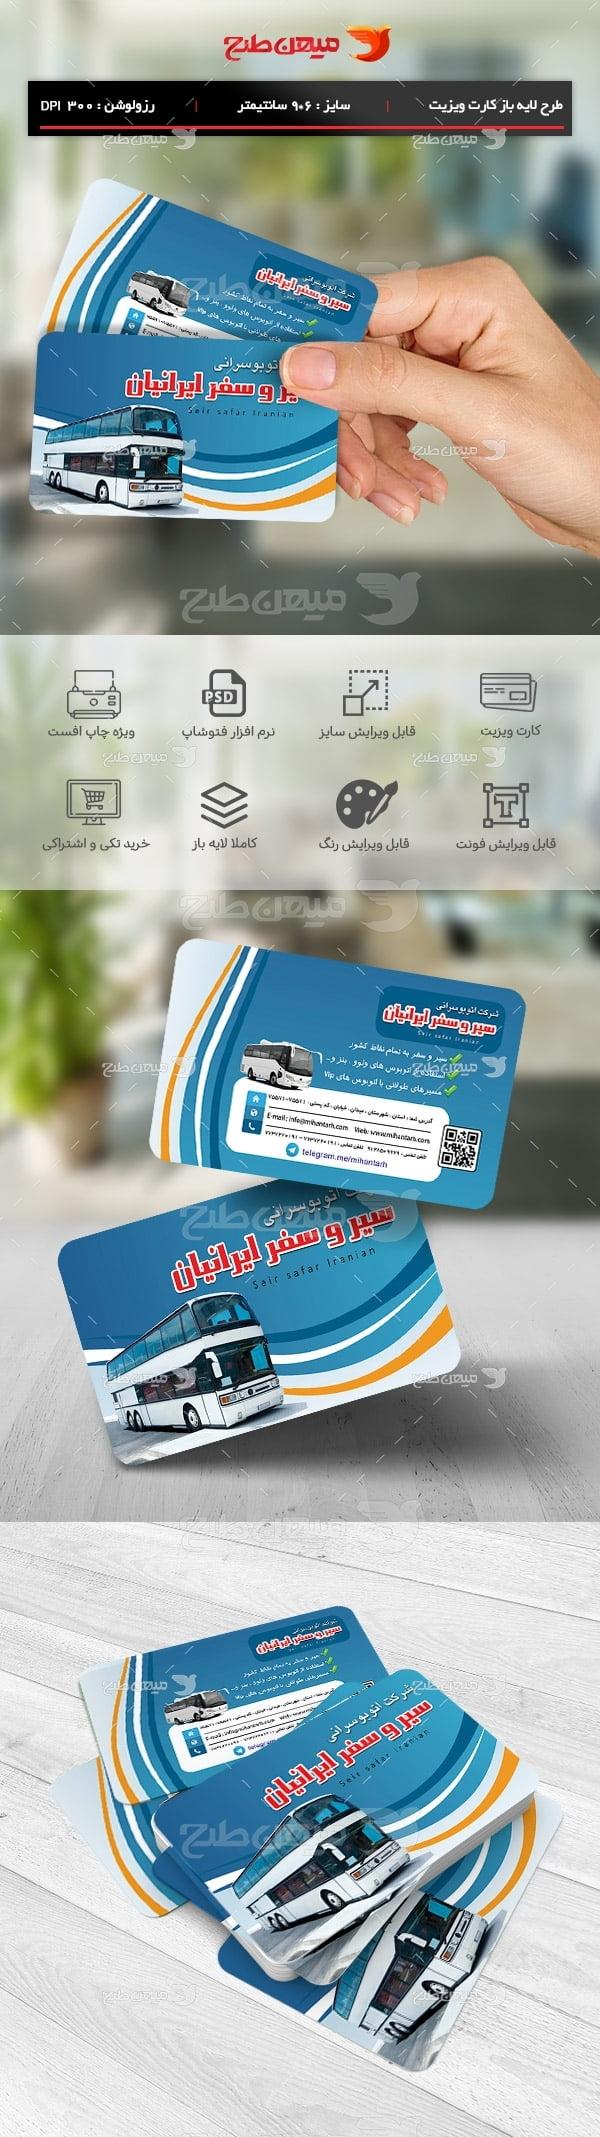 طرح کارت ویزیت شرکت اتوبوسرانی